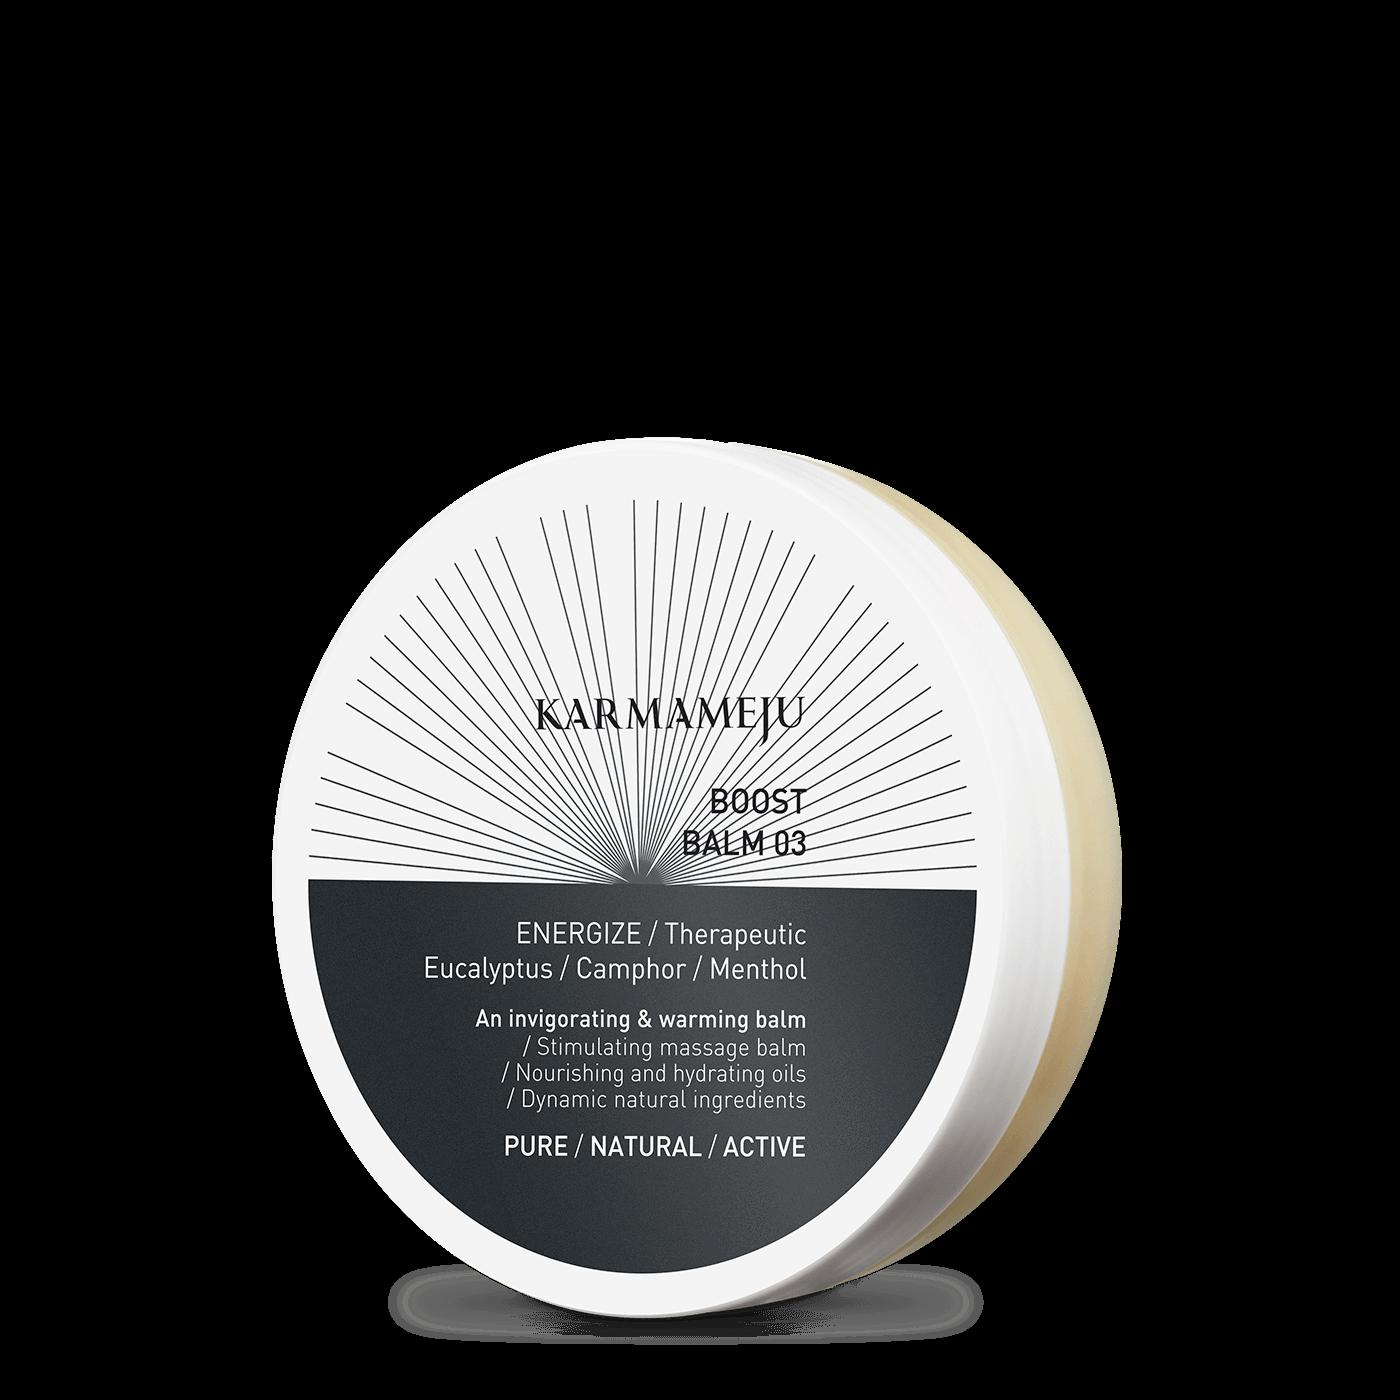 Karmameju BOOST / BALM 03